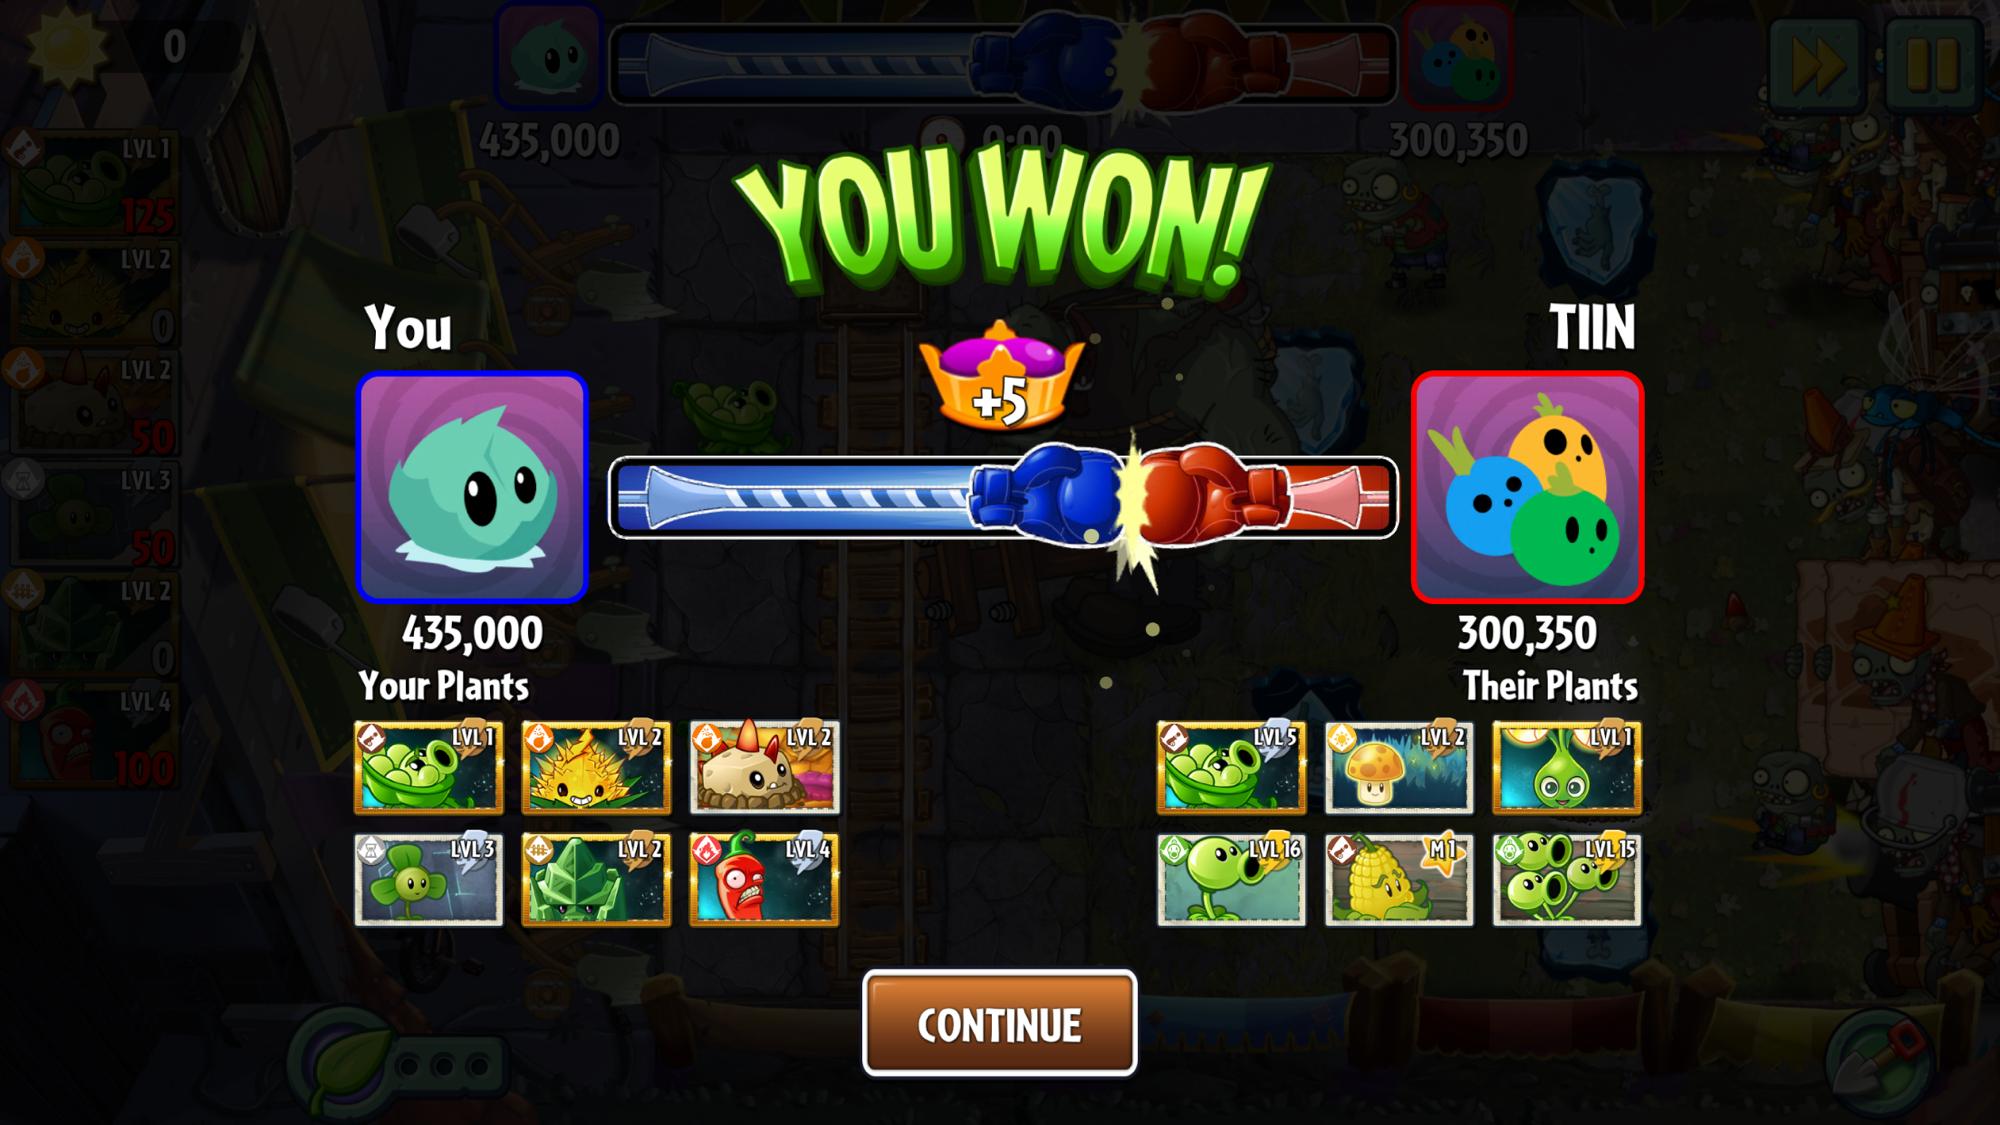 I beat someone